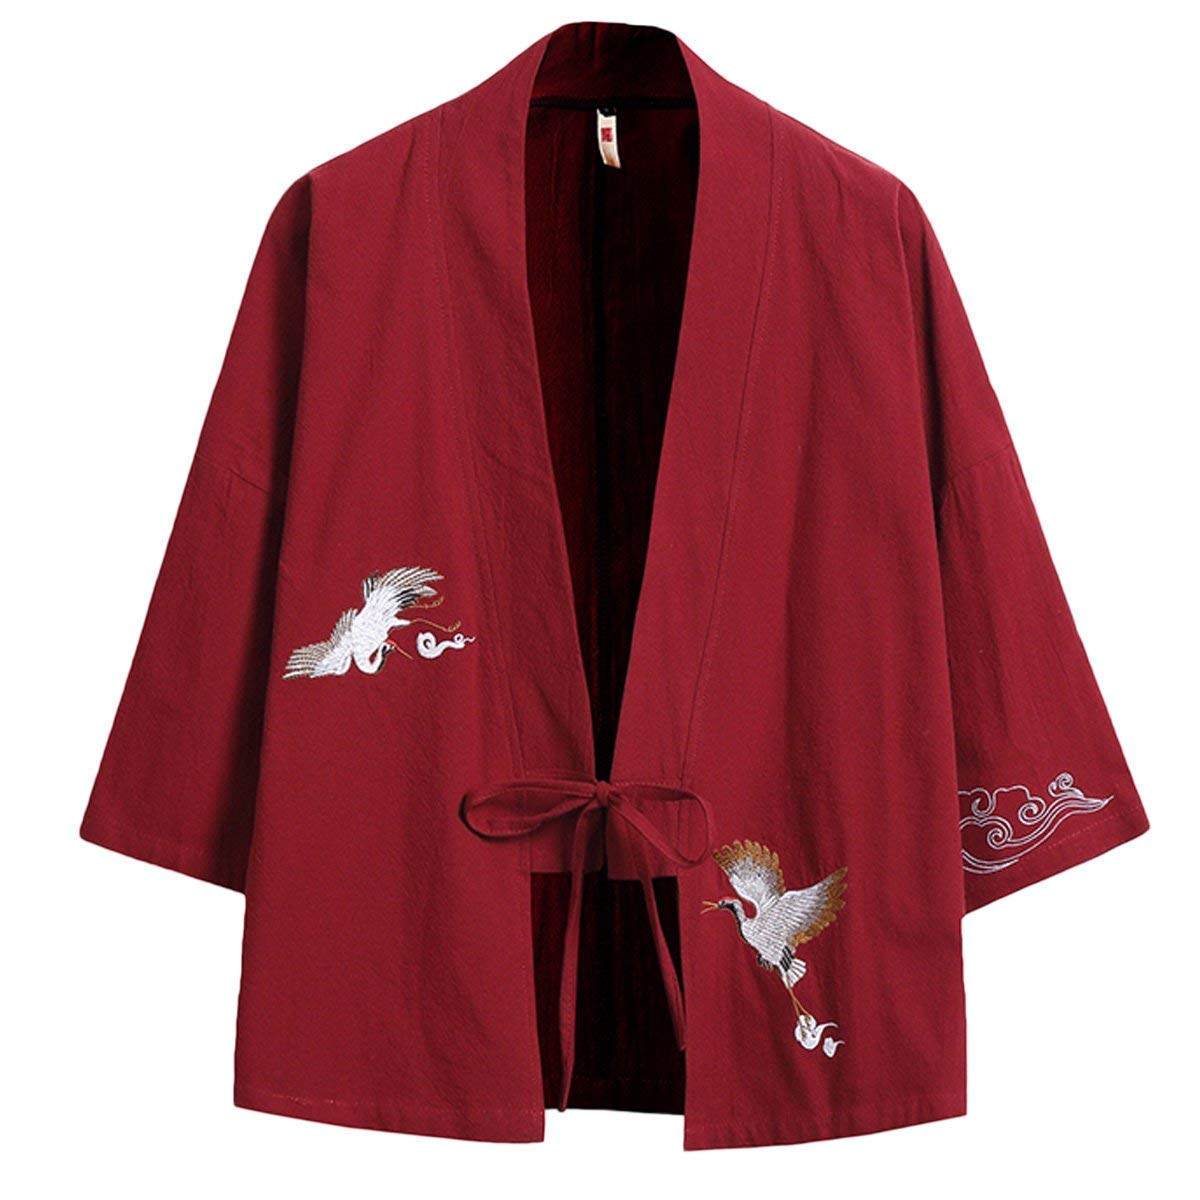 Screenes Chaqueta Hombre Abrigos Algodón Kimono Larga Japonés Bordado Vendaje Manga Cazadoras Suelto Outwear Chaquetas Abrigo: Amazon.es: Ropa y accesorios